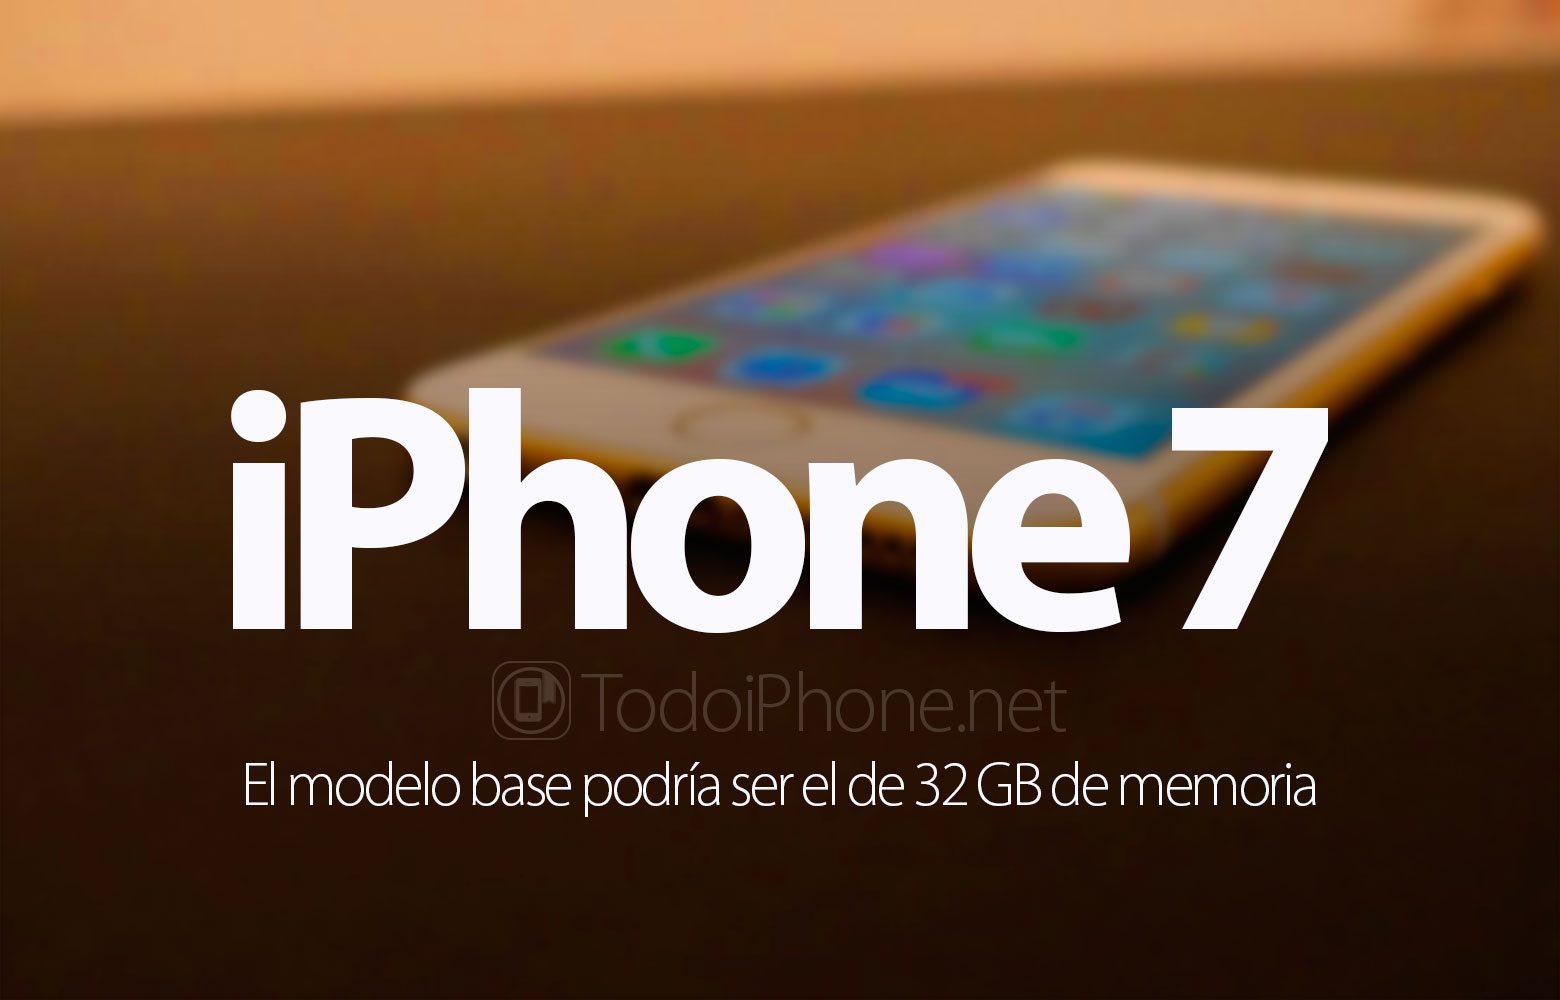 iphone-7-modelo-base-sera-32-gb